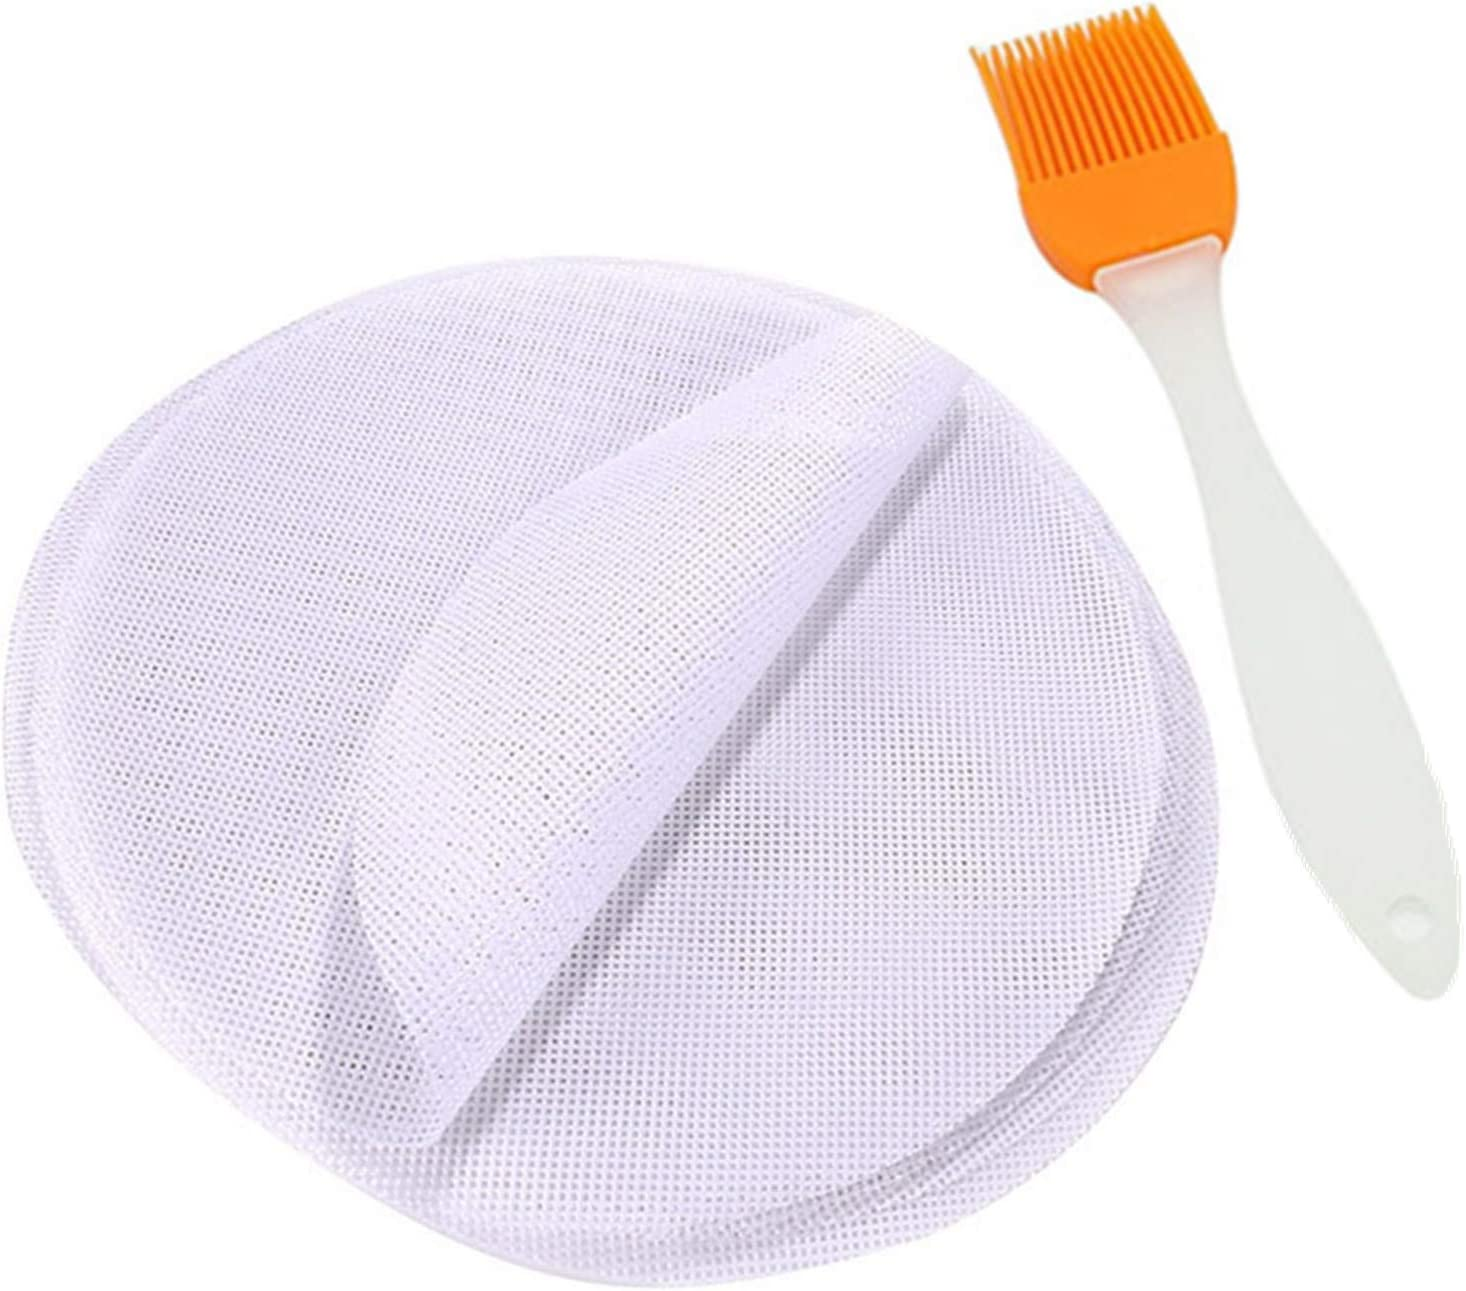 GUCUJI 4 piezas 8 pulgadas silicona antiadherente Steamer Liners Malla Mat Pad Steamed Buns Dumplings Hornear Pasteler/ía Dim Sum Malla